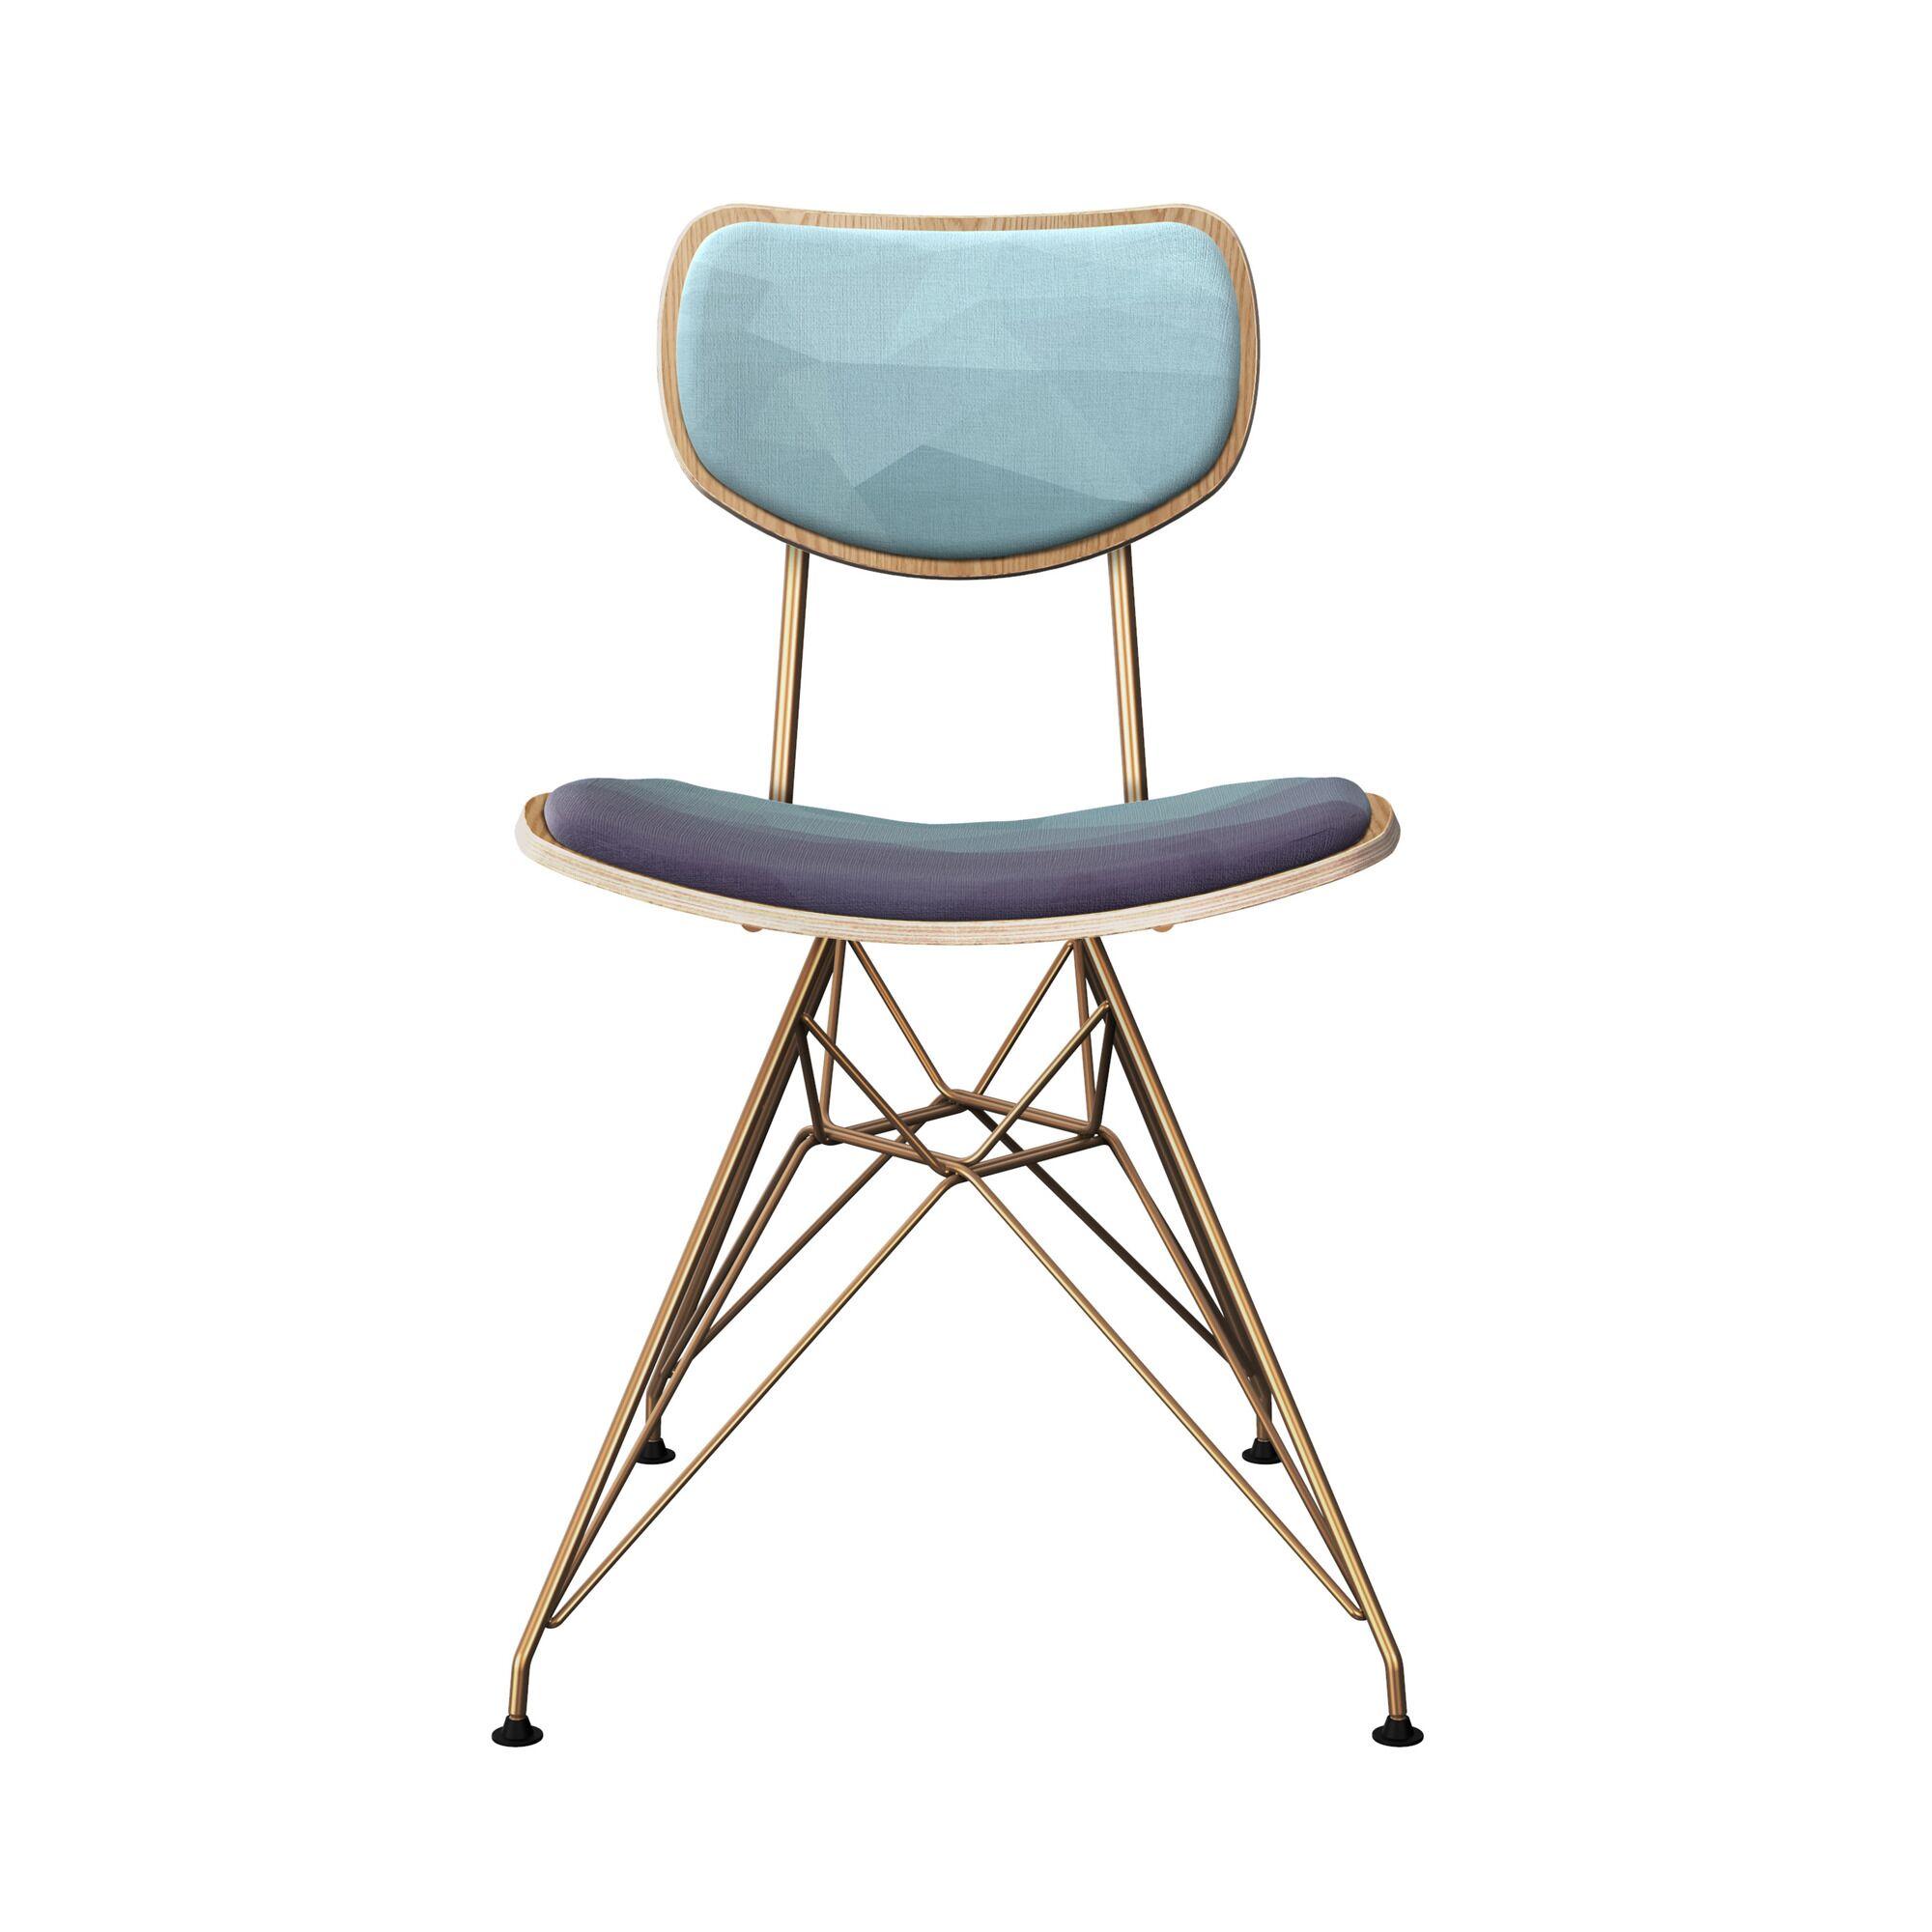 Crendon Upholstered Dining Chair Leg Color: Brass, Frame Color: Natural